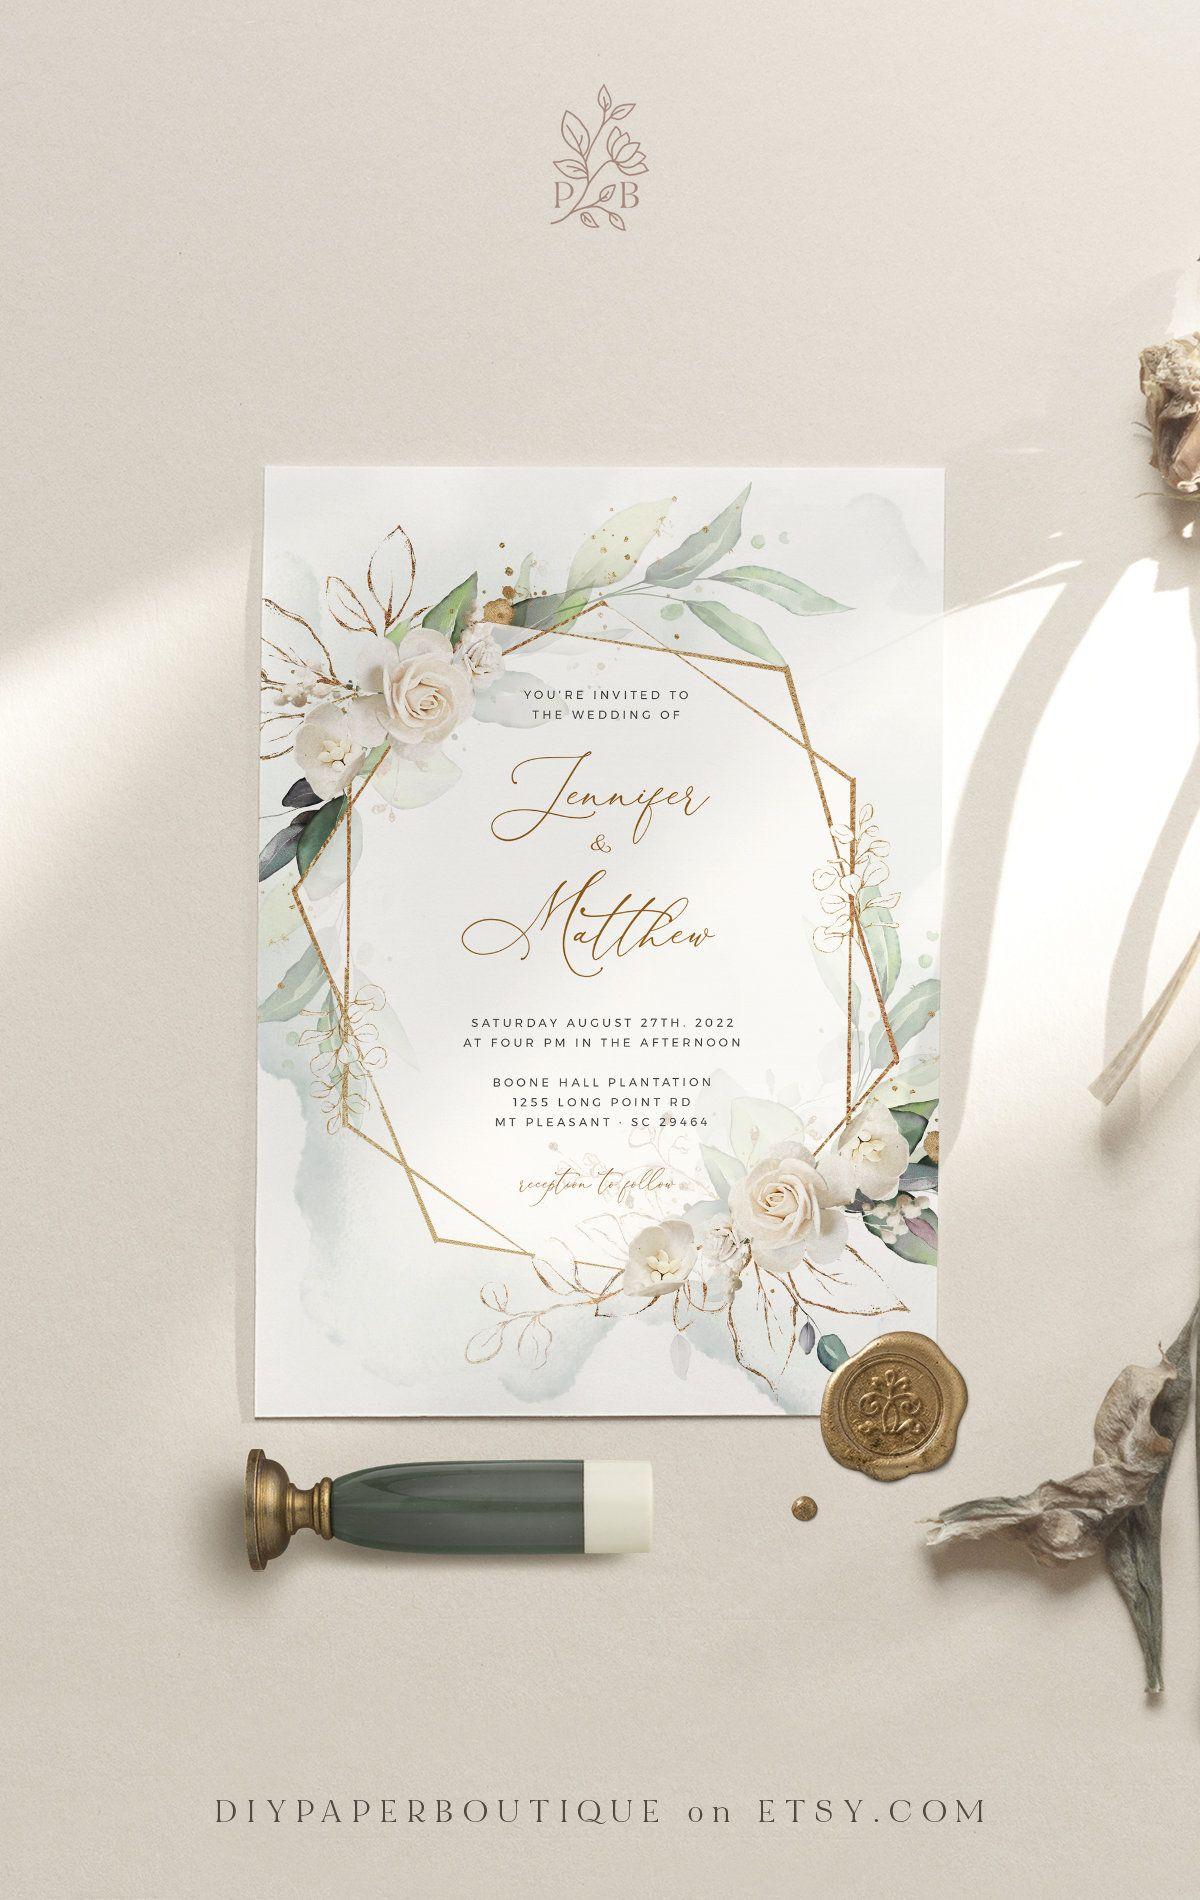 MARCI - Geometric Wedding Invitation Template, White Rose Faux